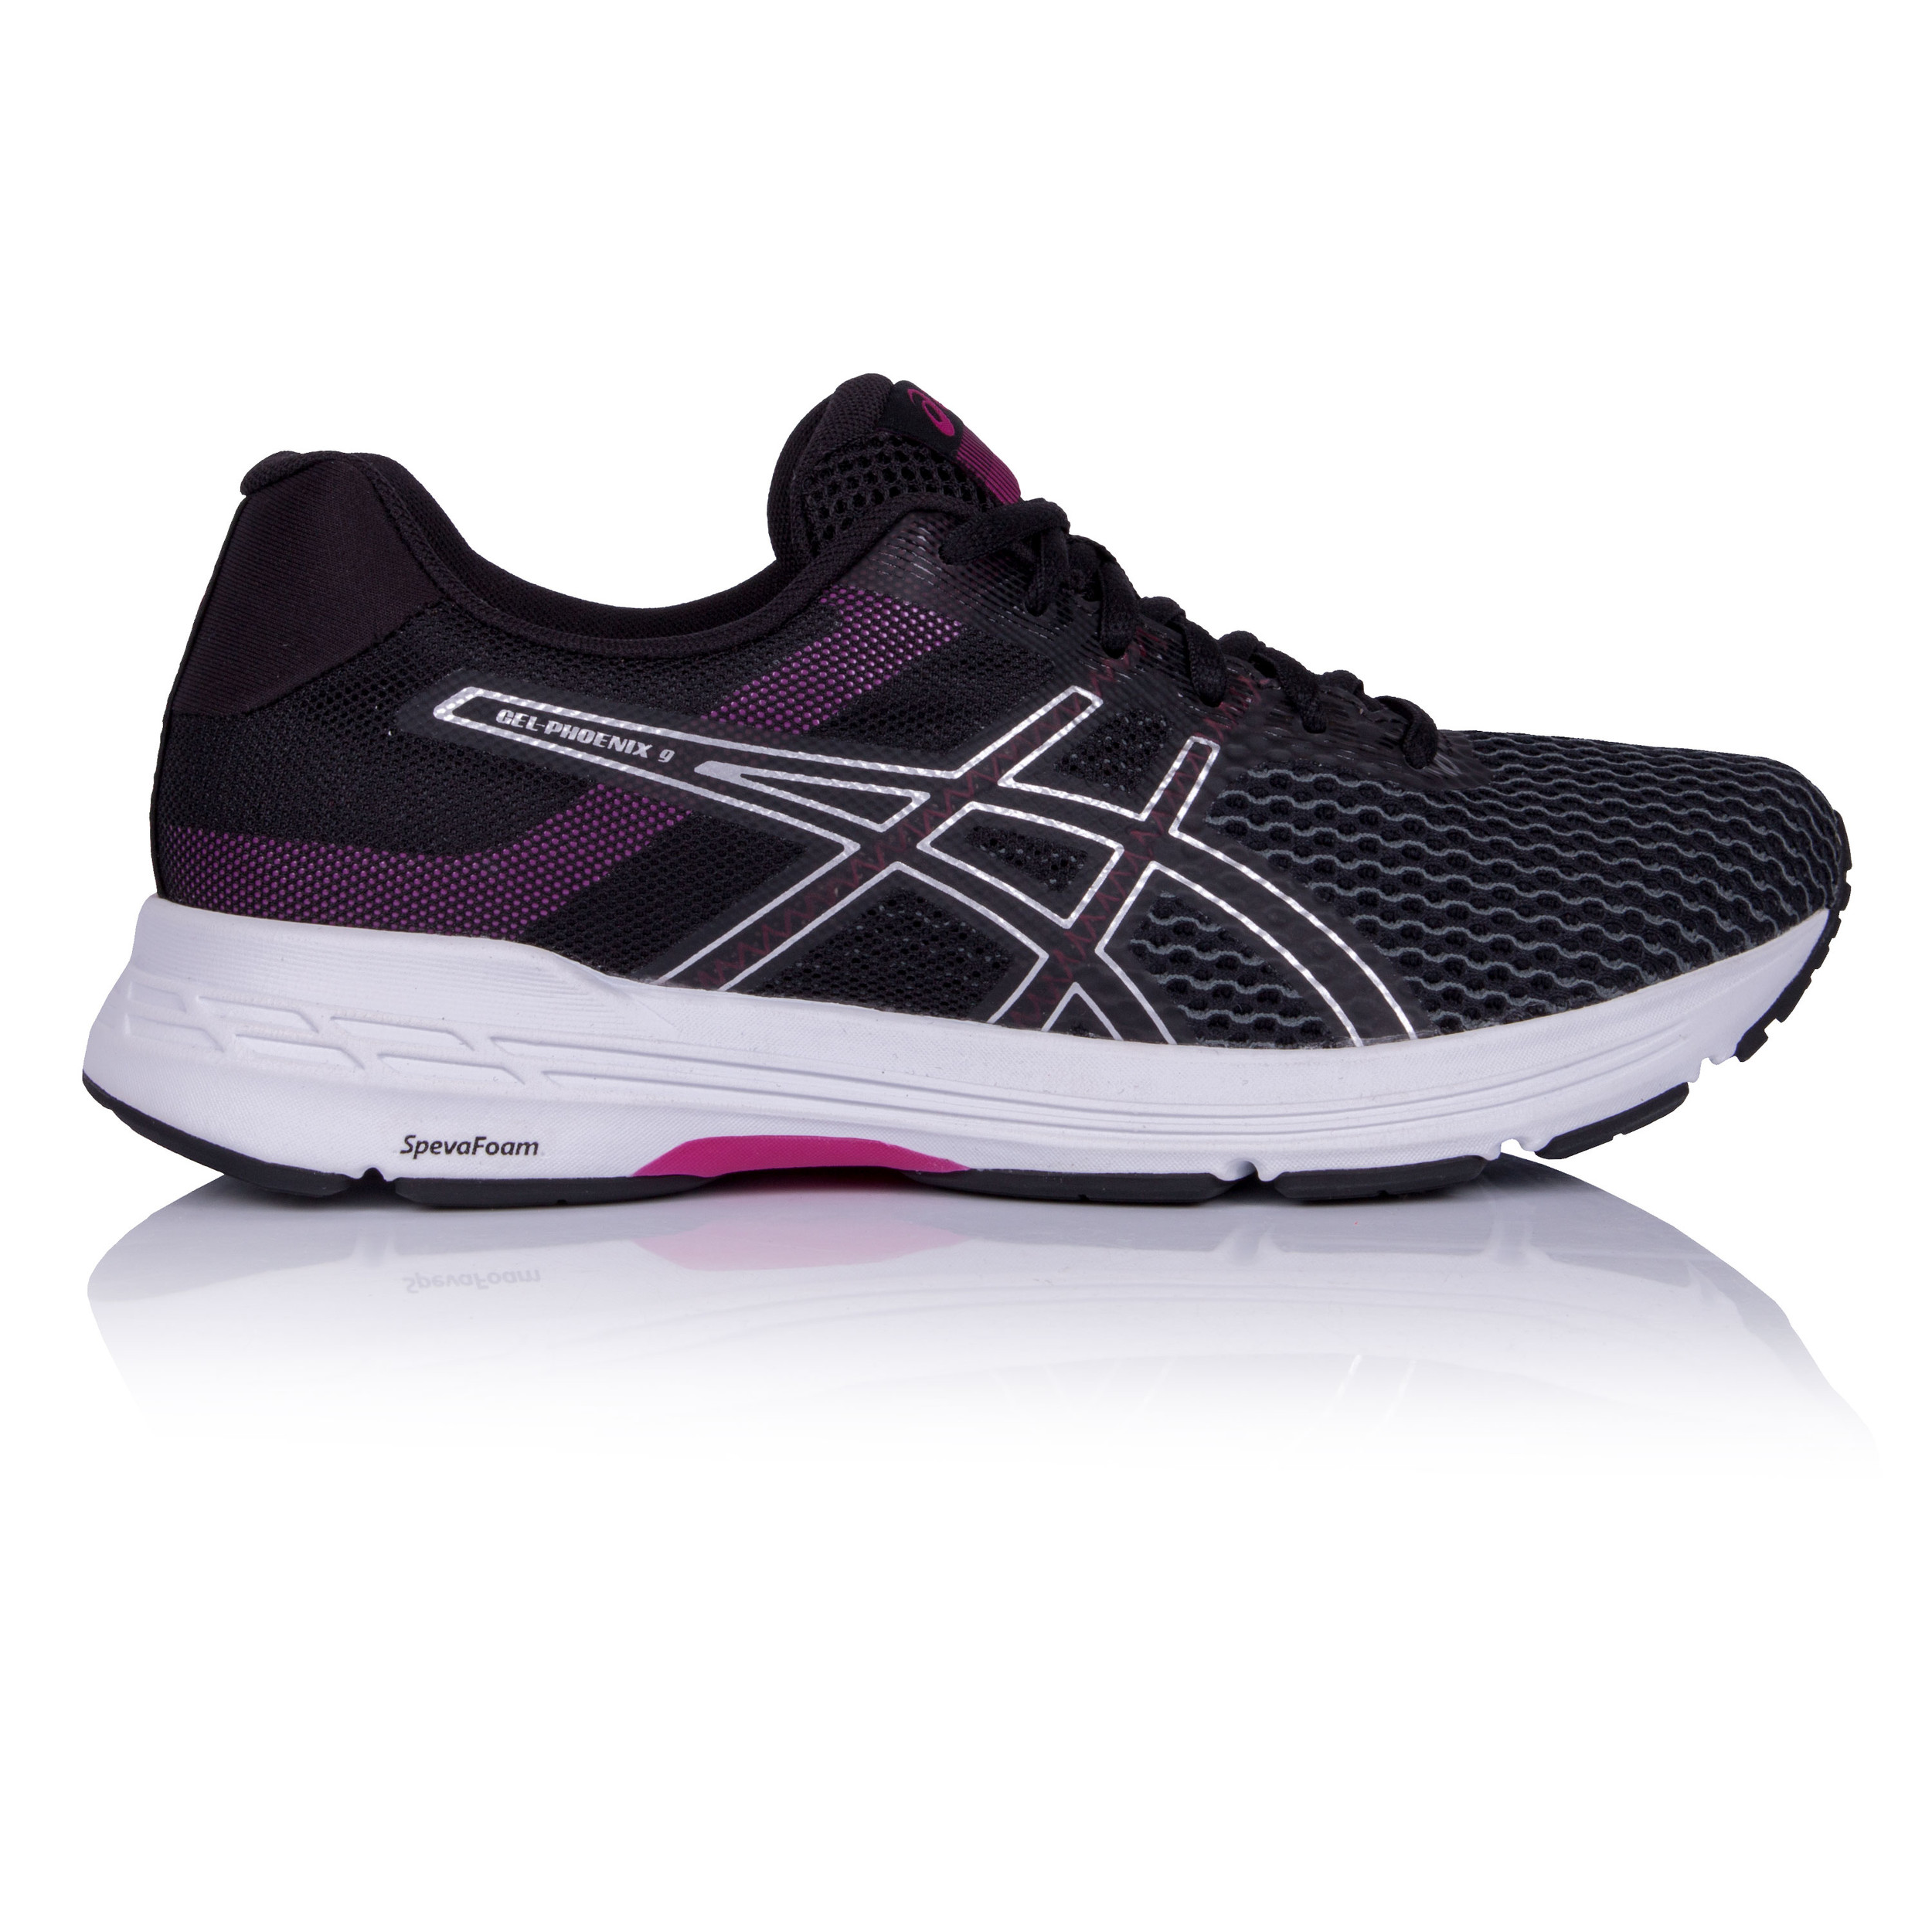 De Zapatillas Mujer Correr Zapatos Gel Detalles Deporte Phoenix Asics Negro Running 9 jLR453A